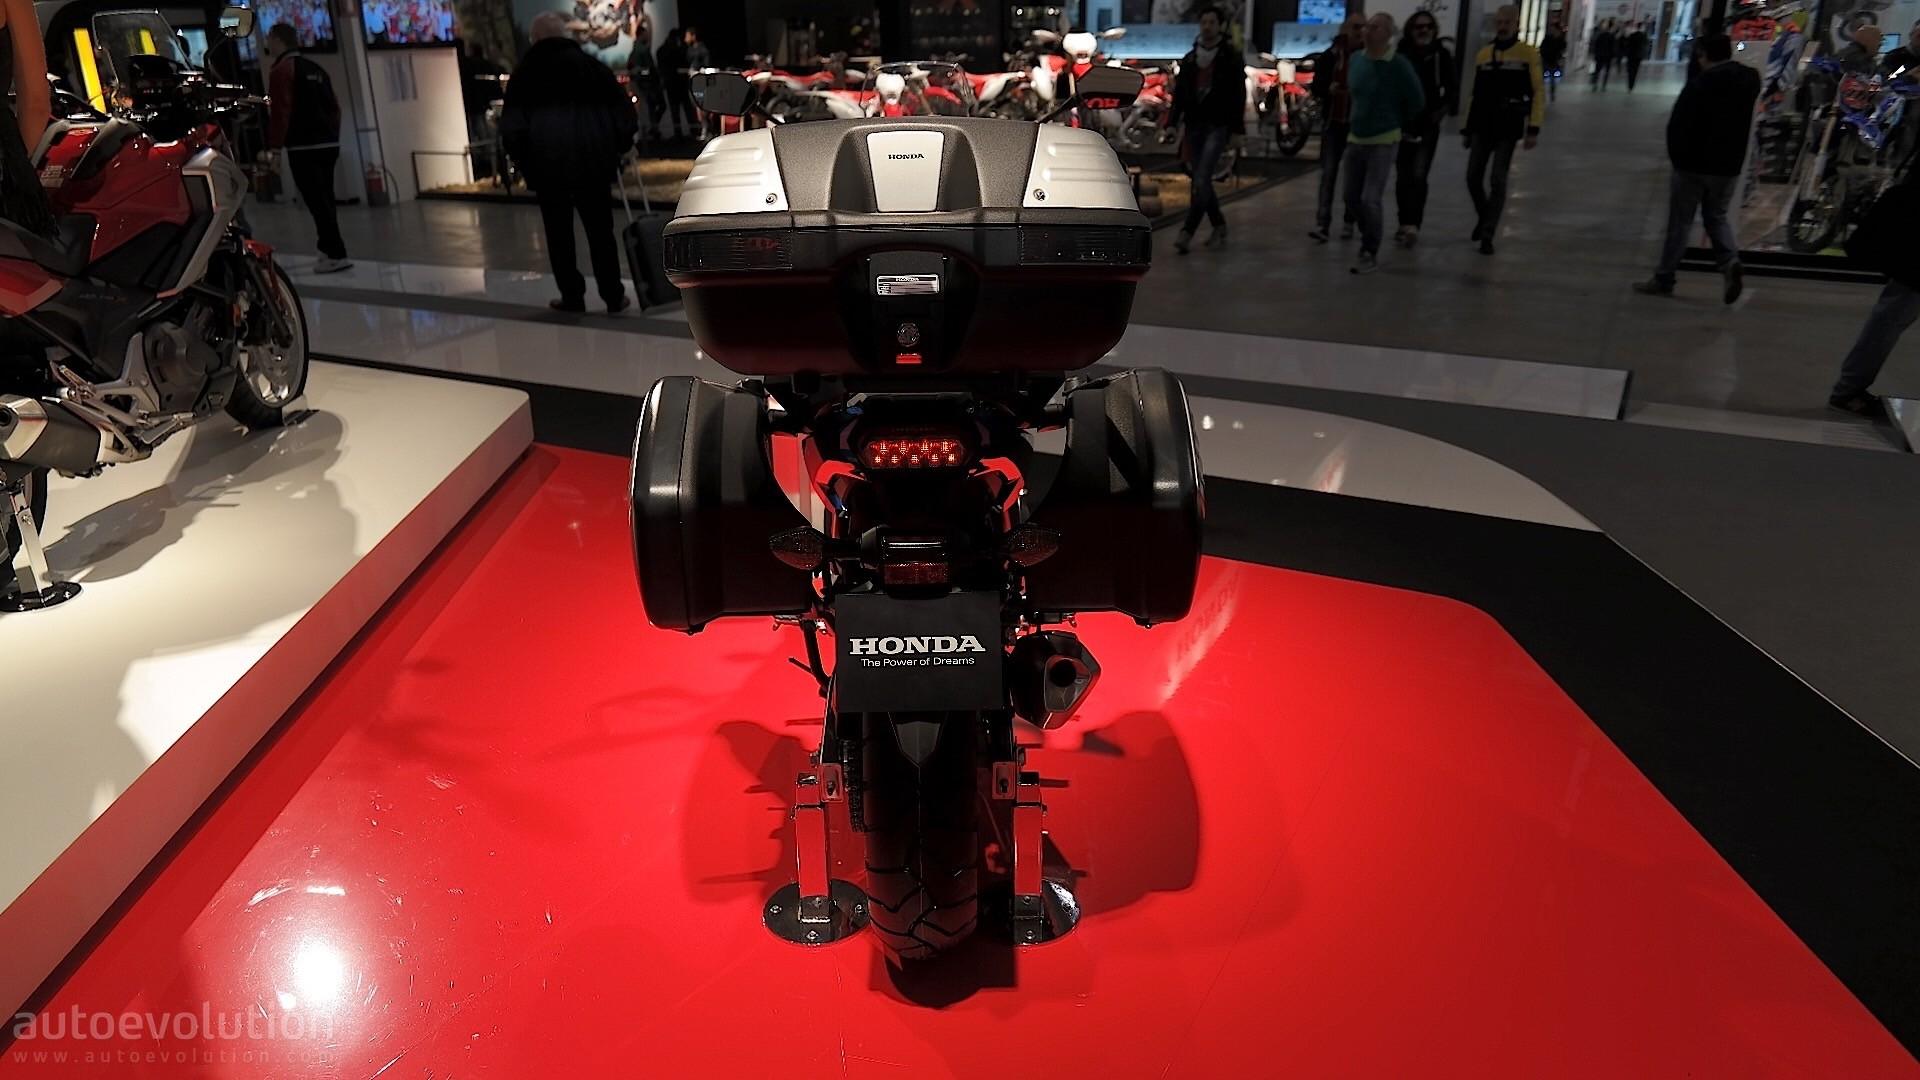 EICMA: 2016 Honda NC750X Shows Sharpened Looks and Several Upgrades - autoevolution